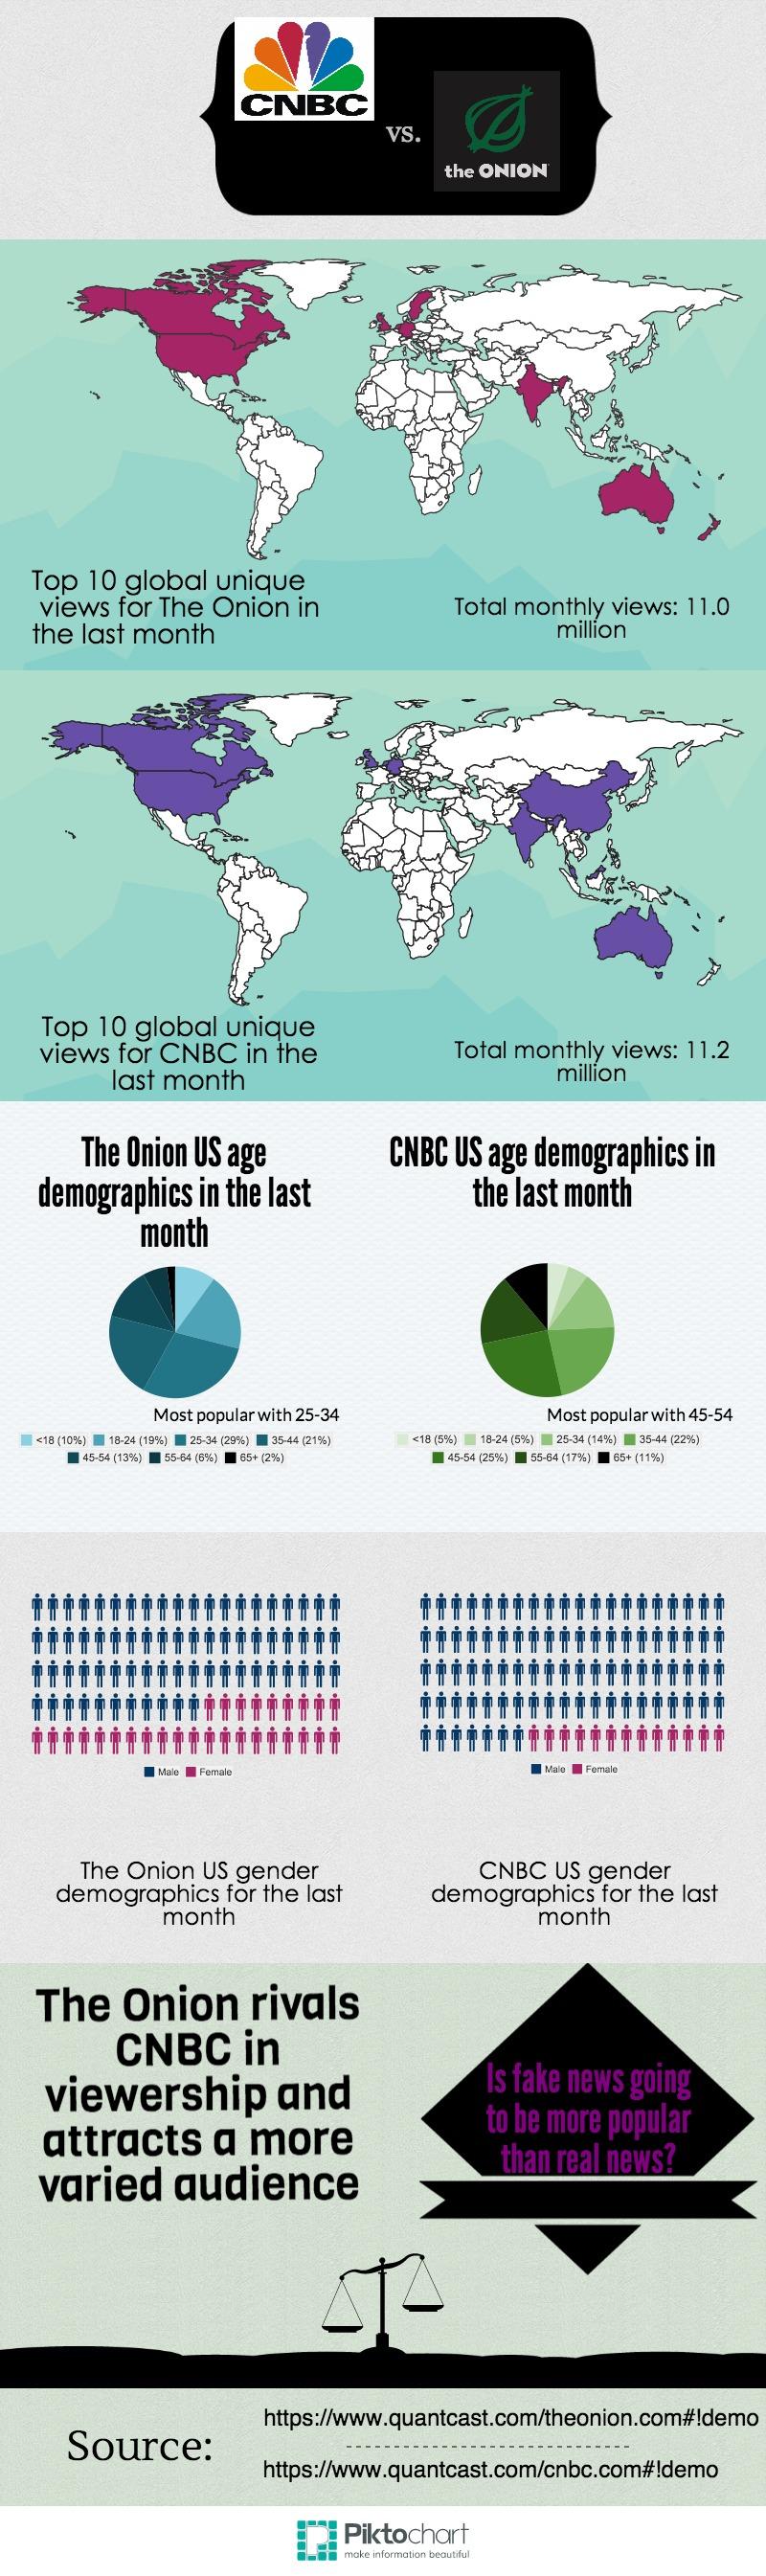 CNBC vs THE ONION